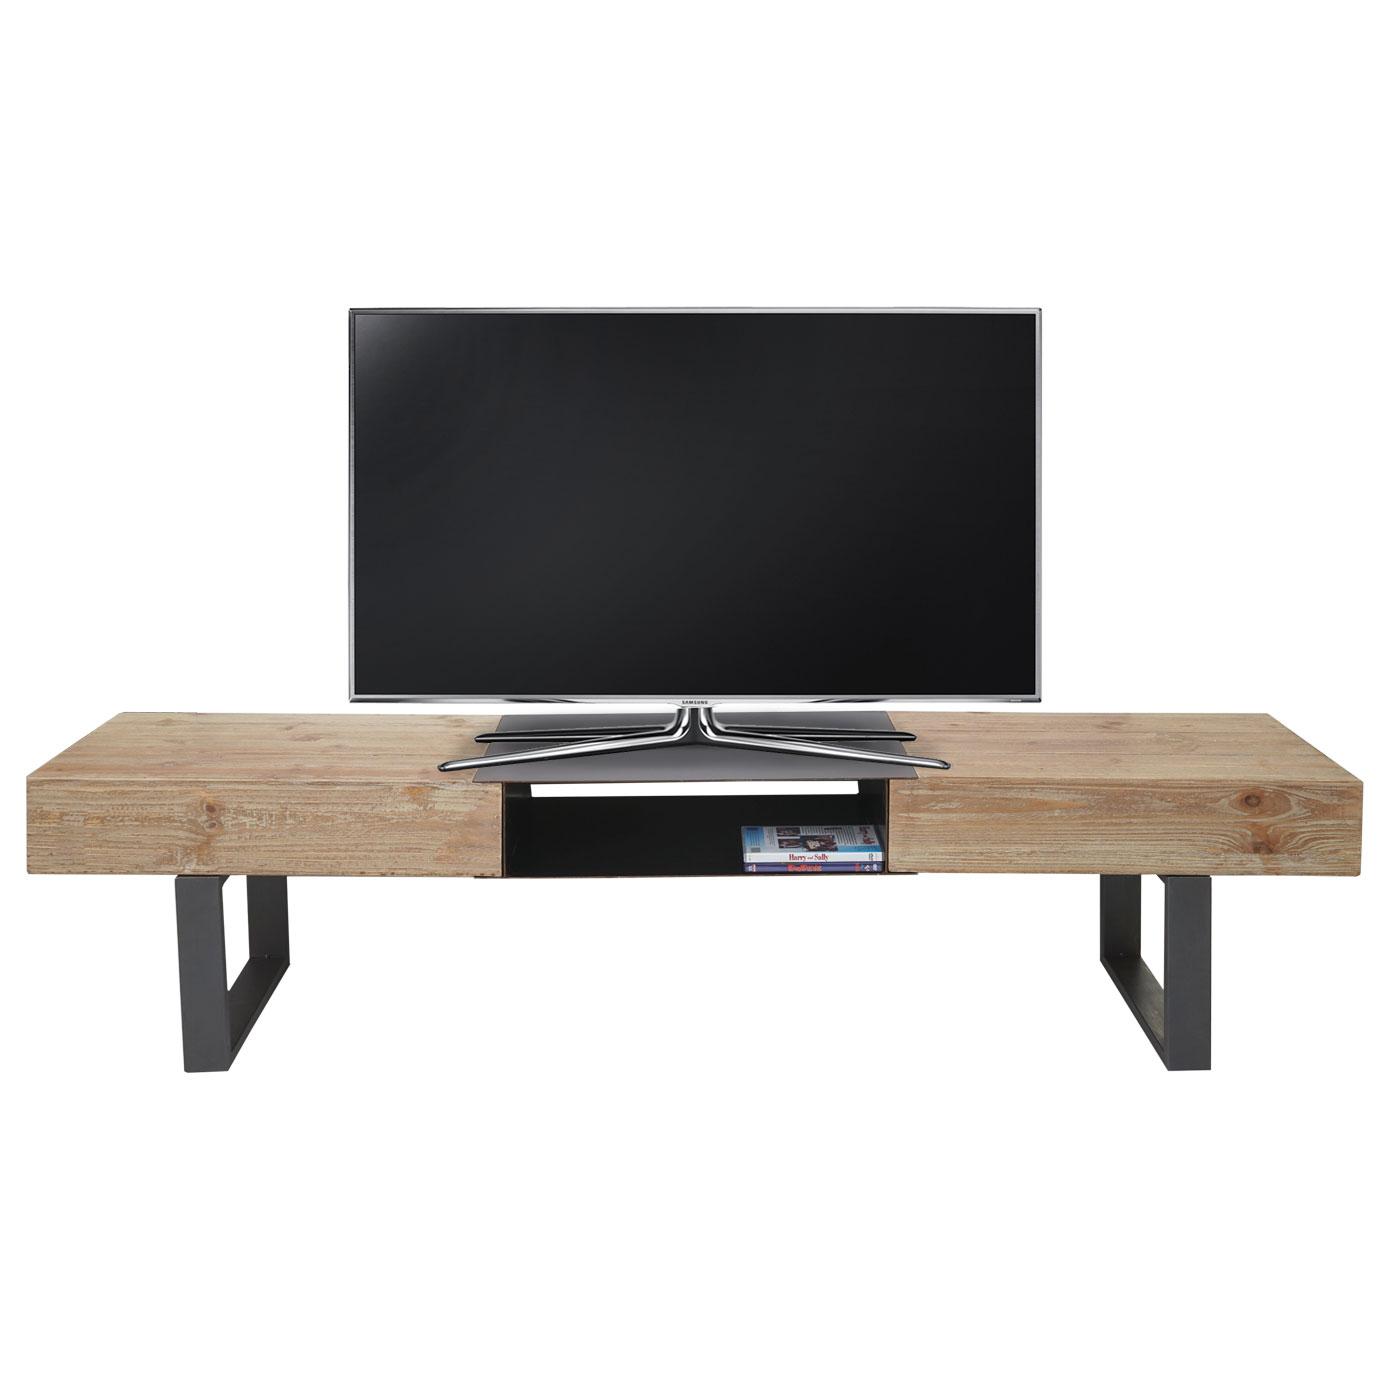 tv rack hwc a15 fernsehtisch tanne holz rustikal massiv 46x180x41cm